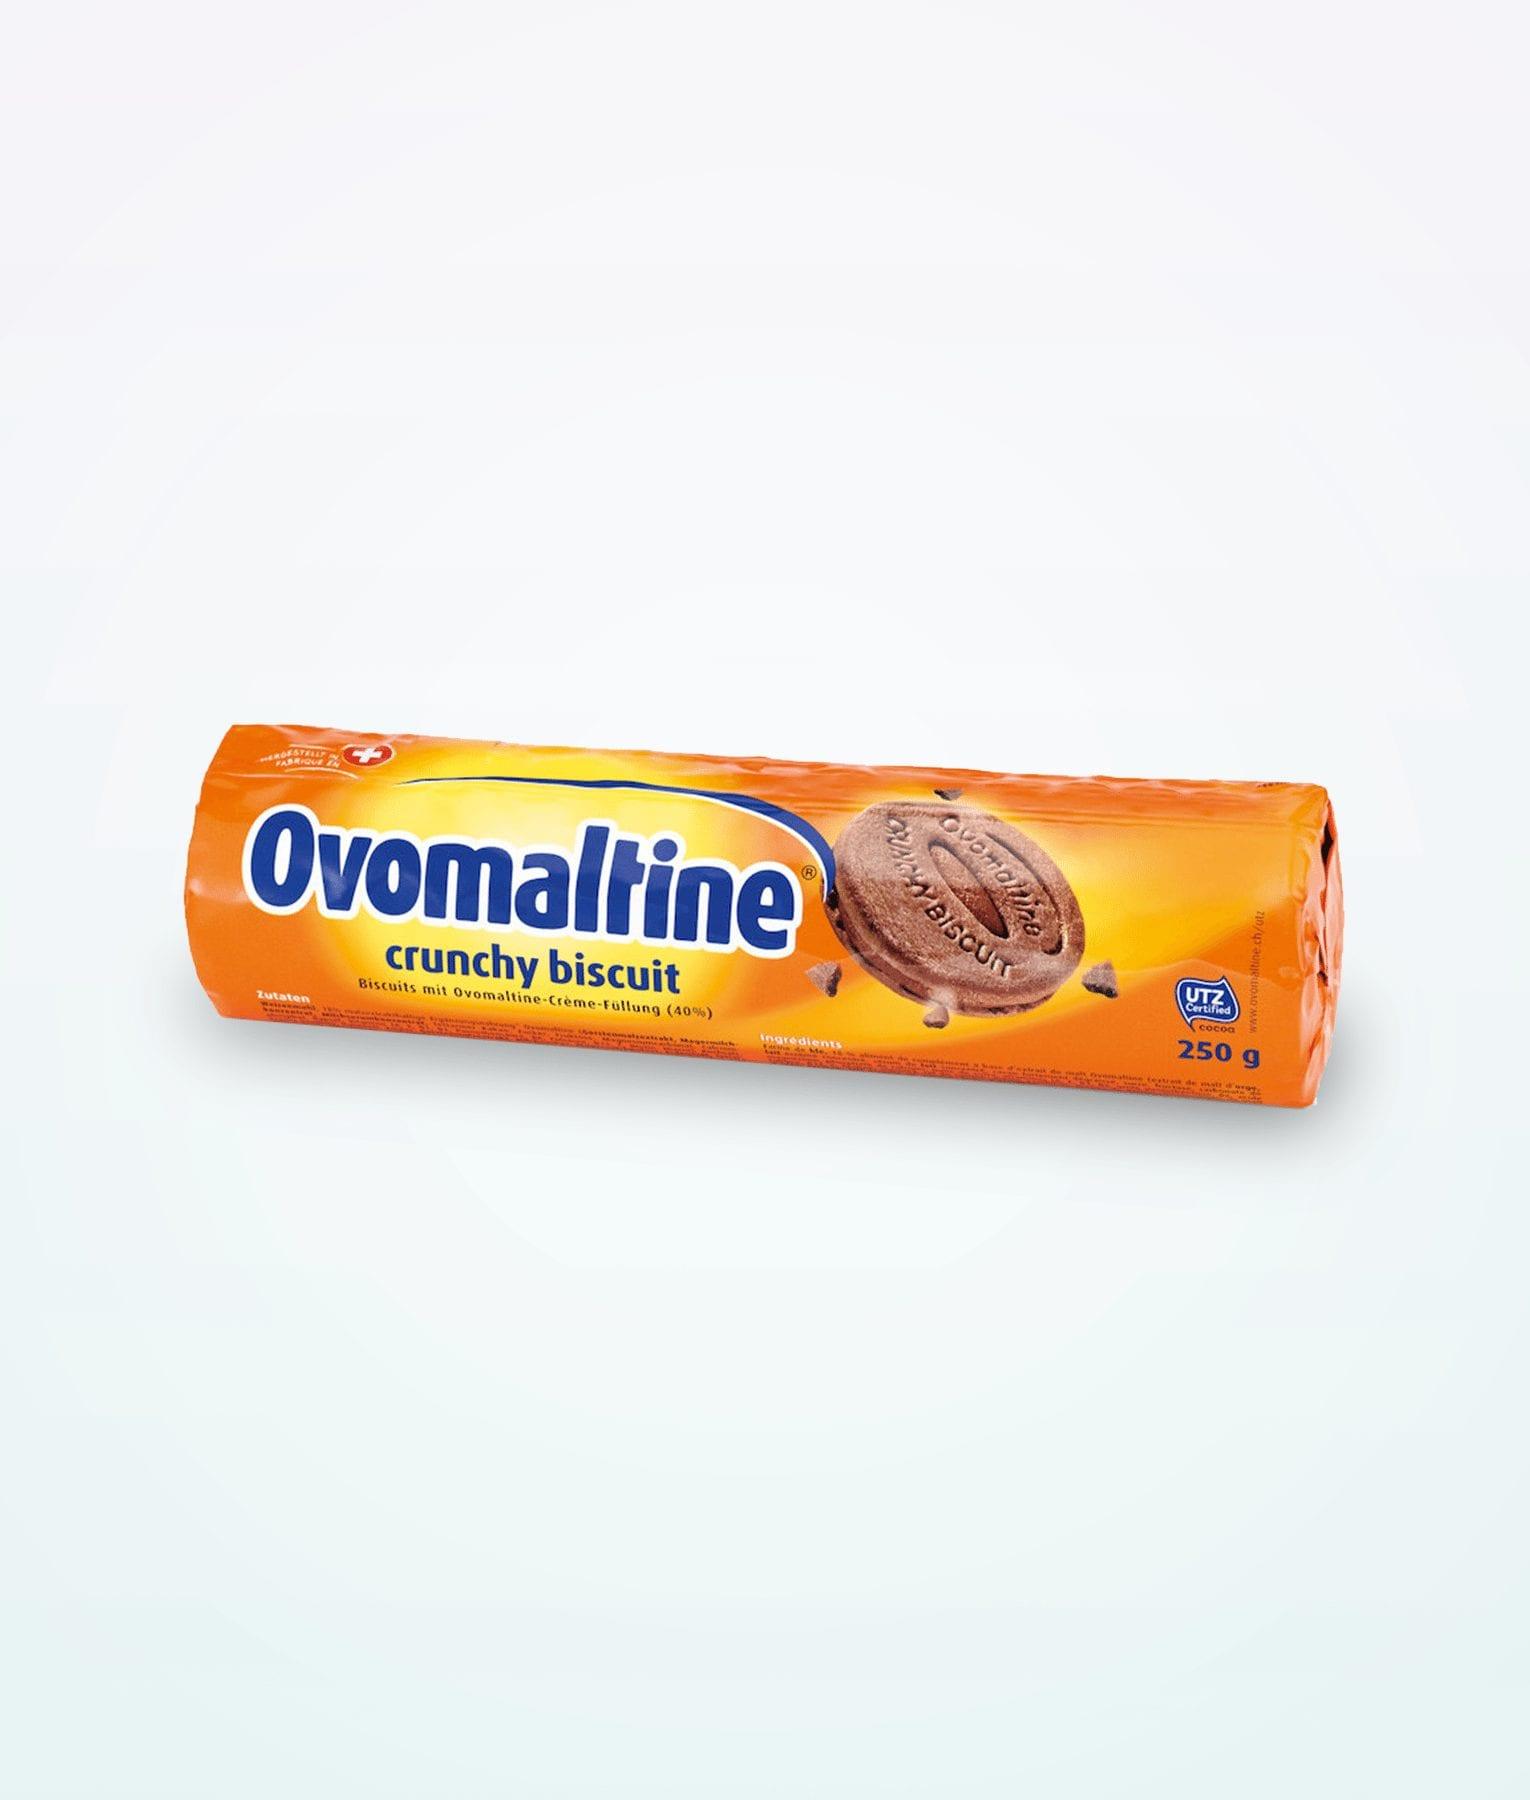 ovomaltine-croquant-biscuit